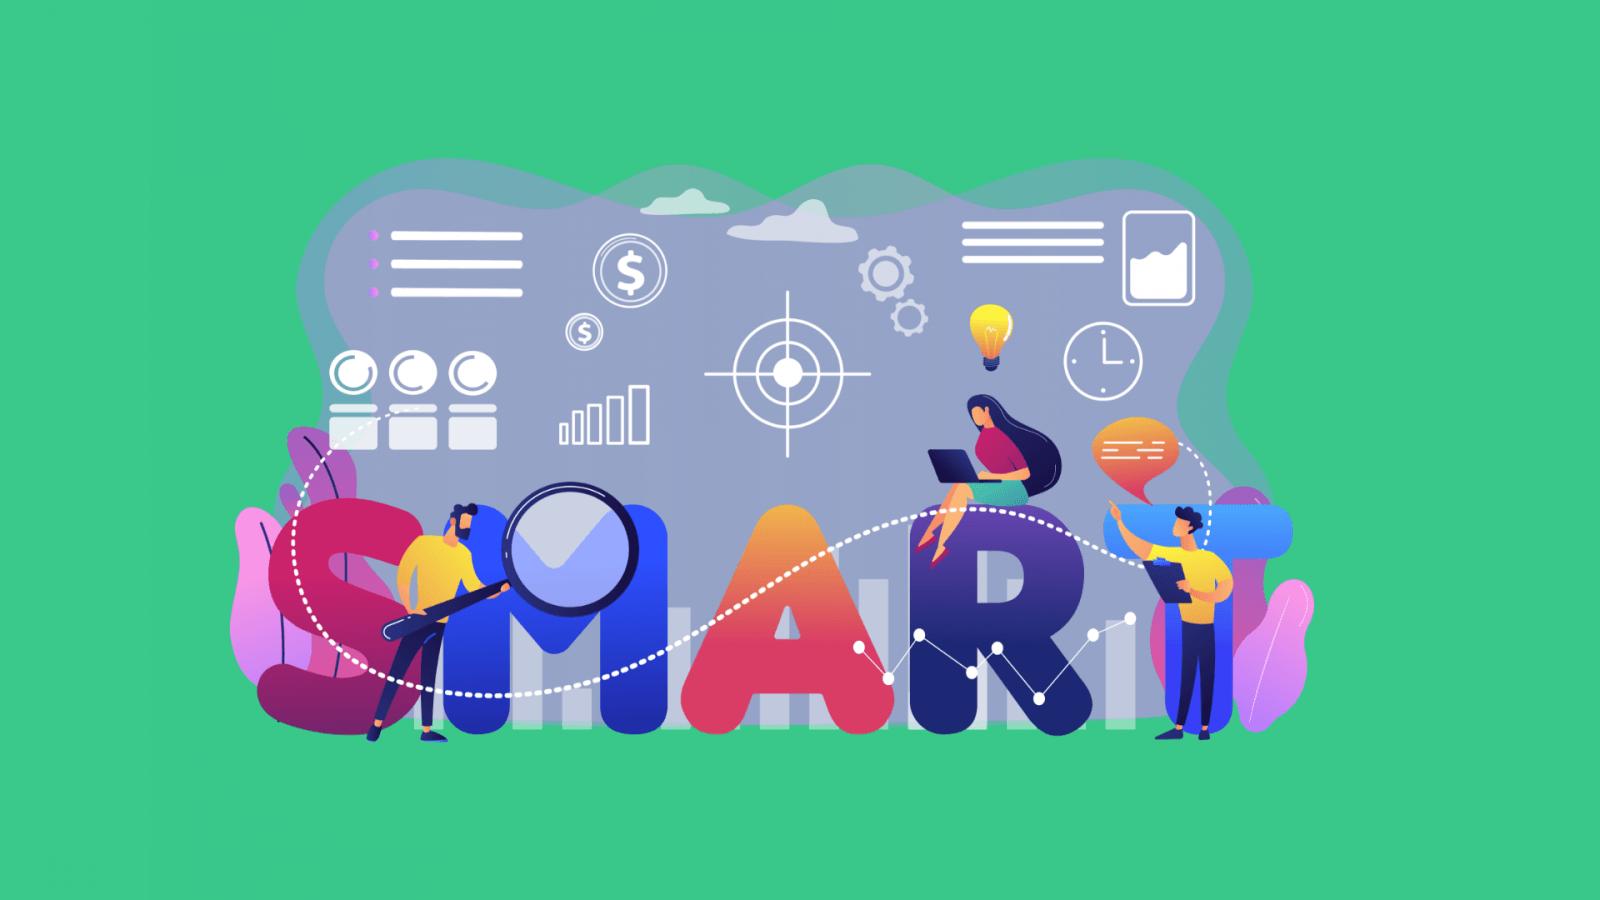 Prepara tus metas para el próximo trimestre: ponte objetivos SMART